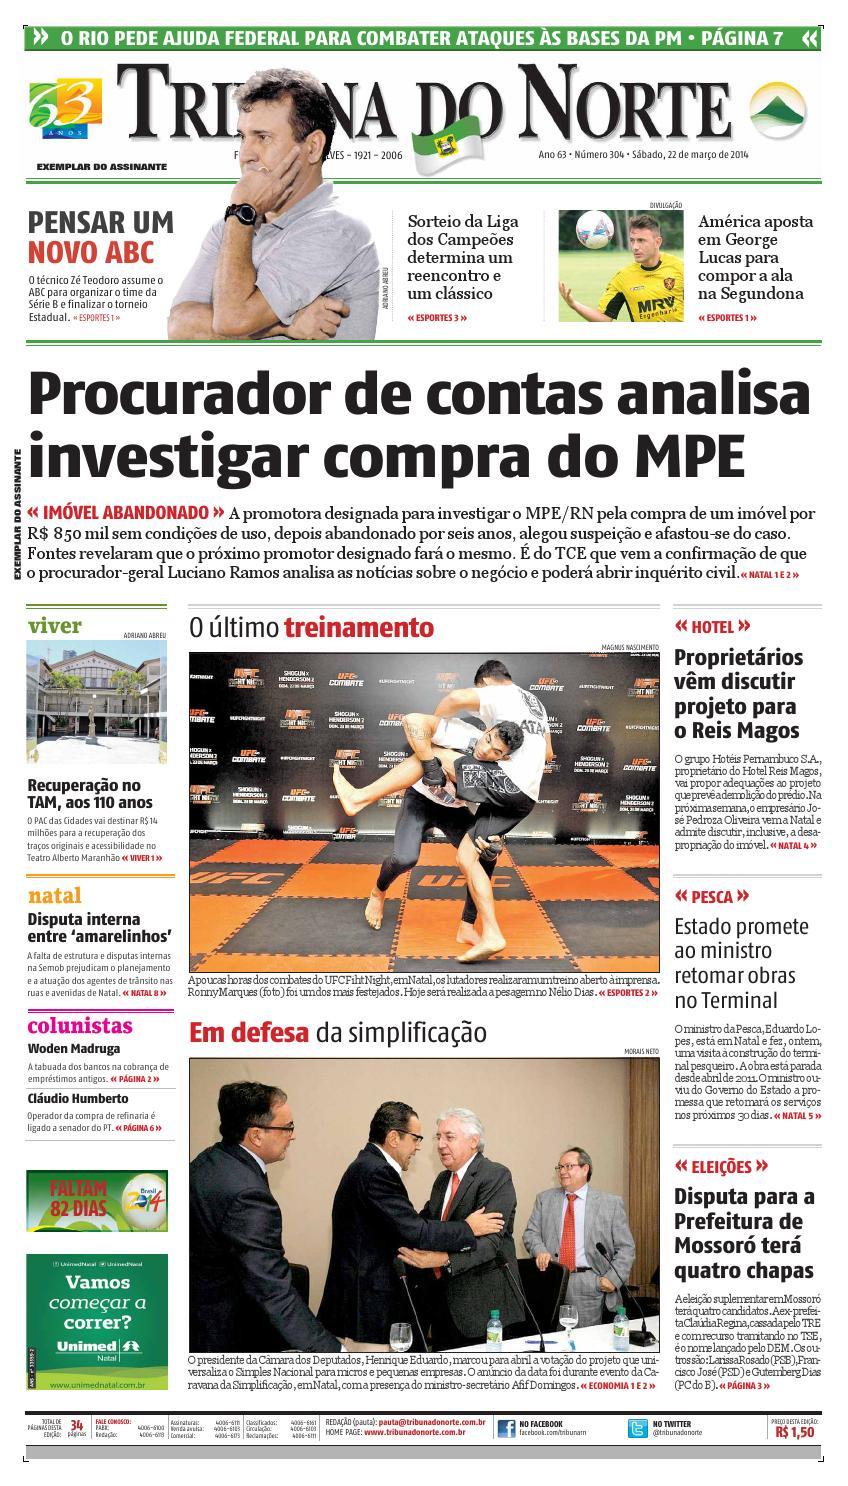 749a2be0ff Tribuna do Norte - 22 03 2014 by Empresa Jornalística Tribuna do Norte Ltda  - issuu